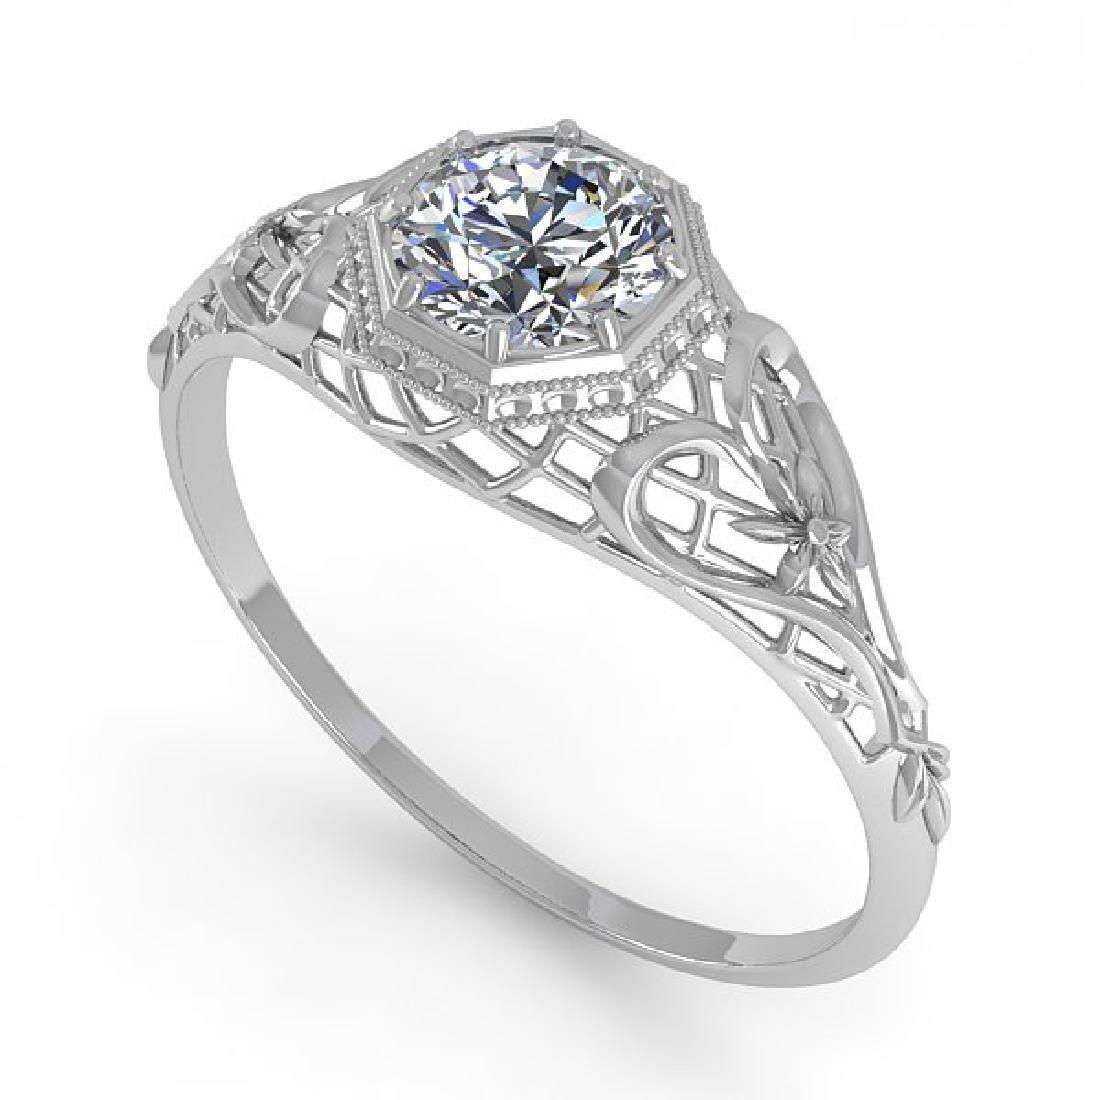 0.50 CTW VS/SI Diamond Solitaire Ring 14K White Gold - 2